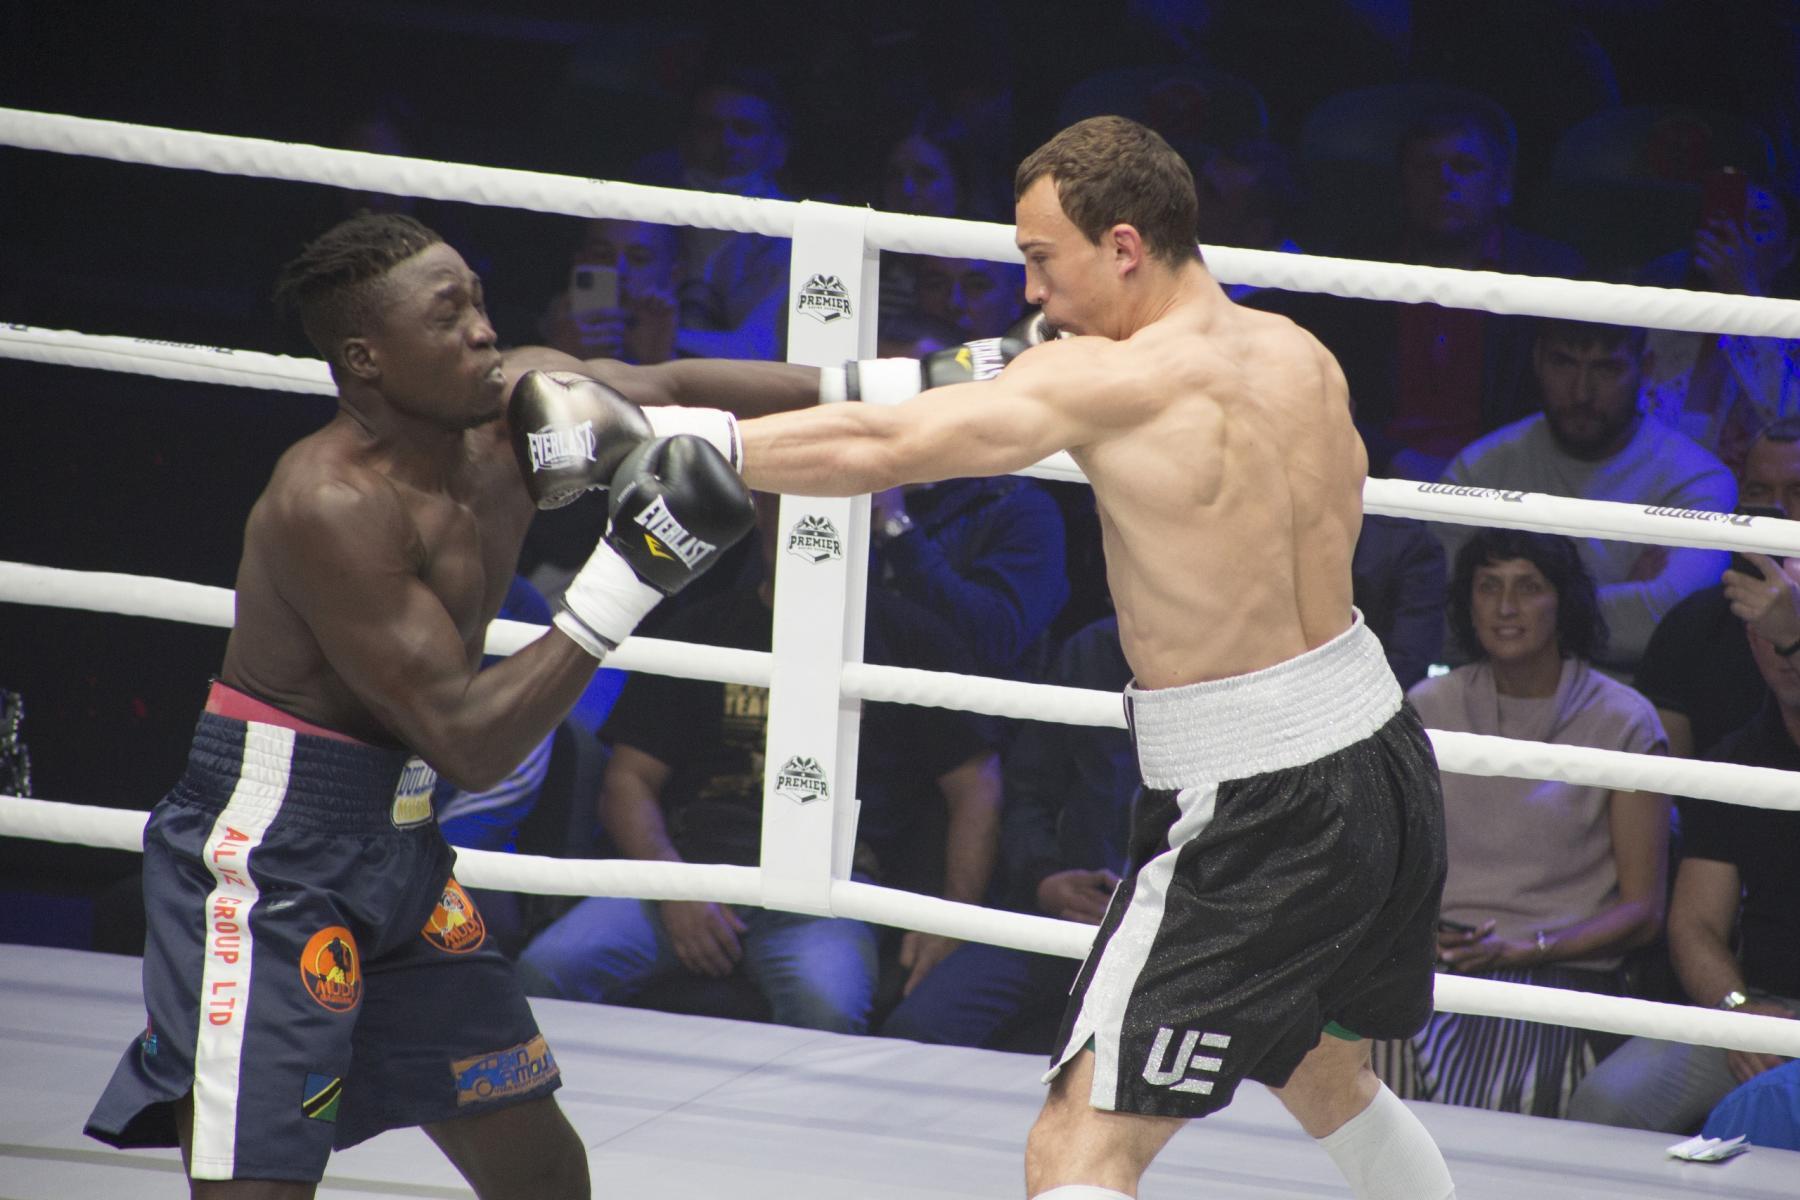 фото Боксёр из Новосибирска Павел Силягин стал азиатско-тихоокеанским чемпионом WBO 6